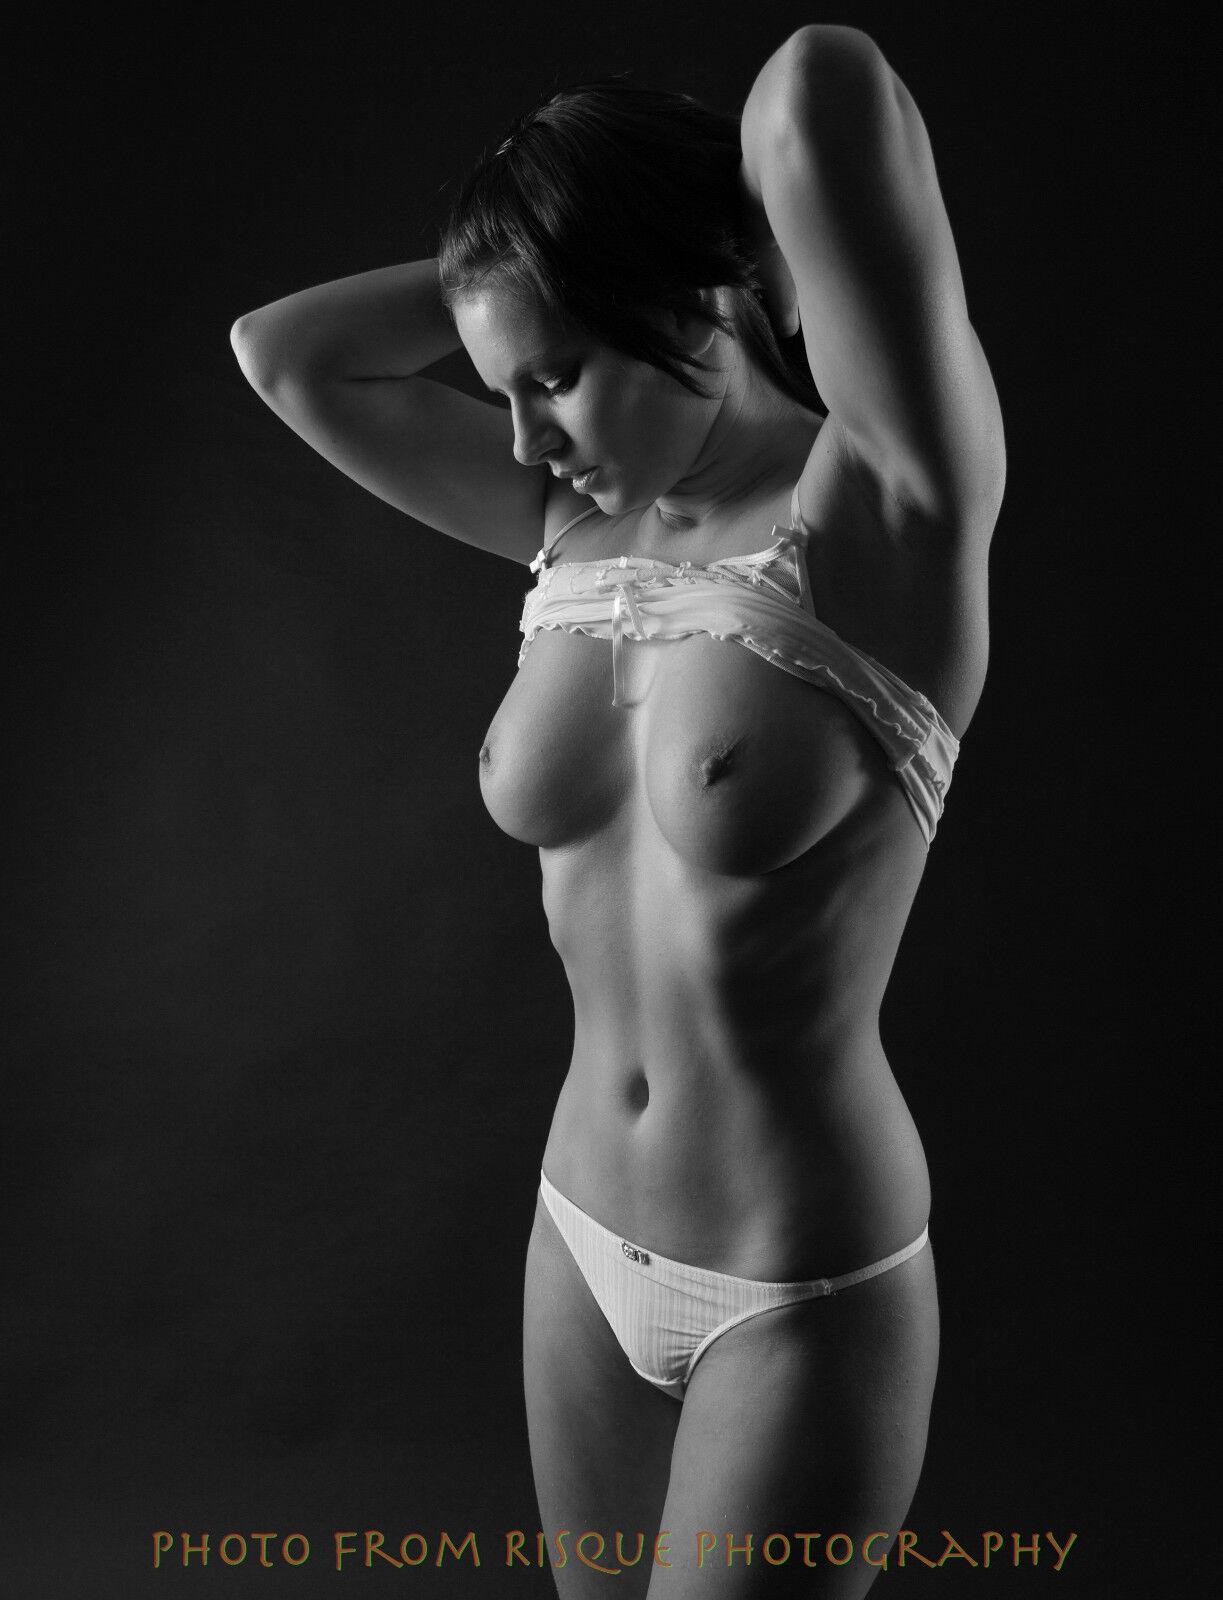 Nude black women photography